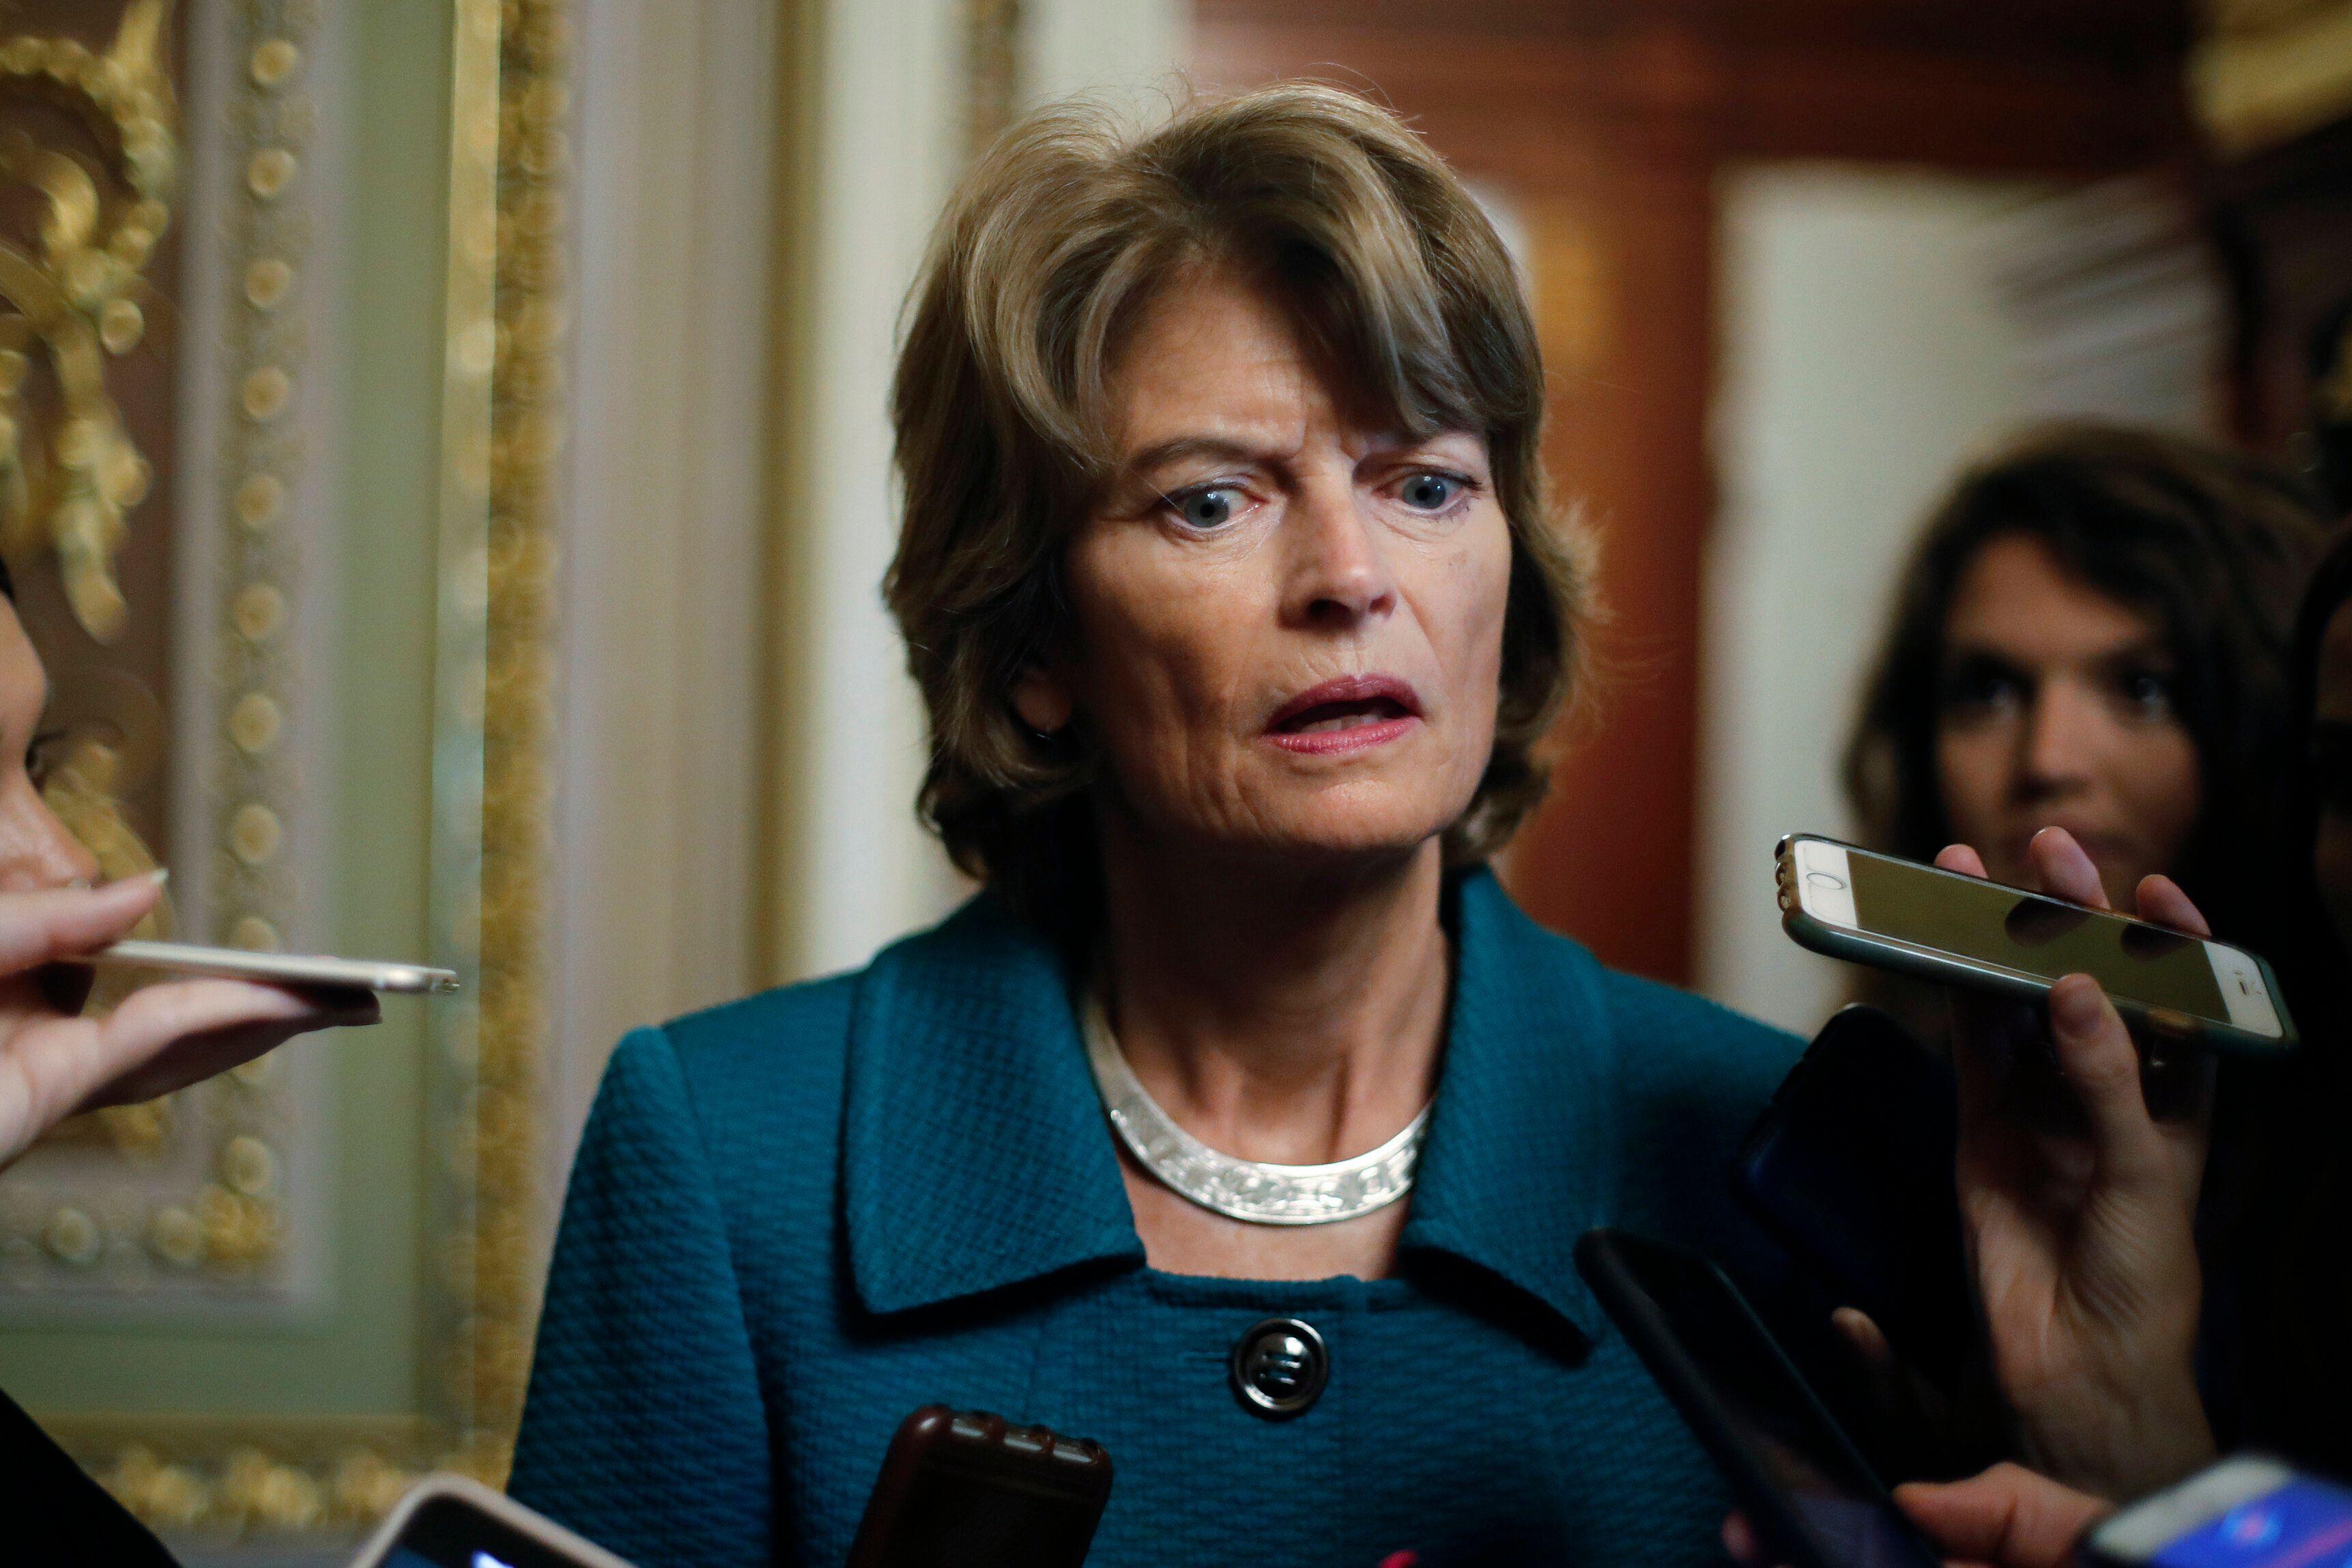 Sen. Lisa Murkowski (R-Alaska) has led congressional efforts to address missing and murdered Indigenous women.